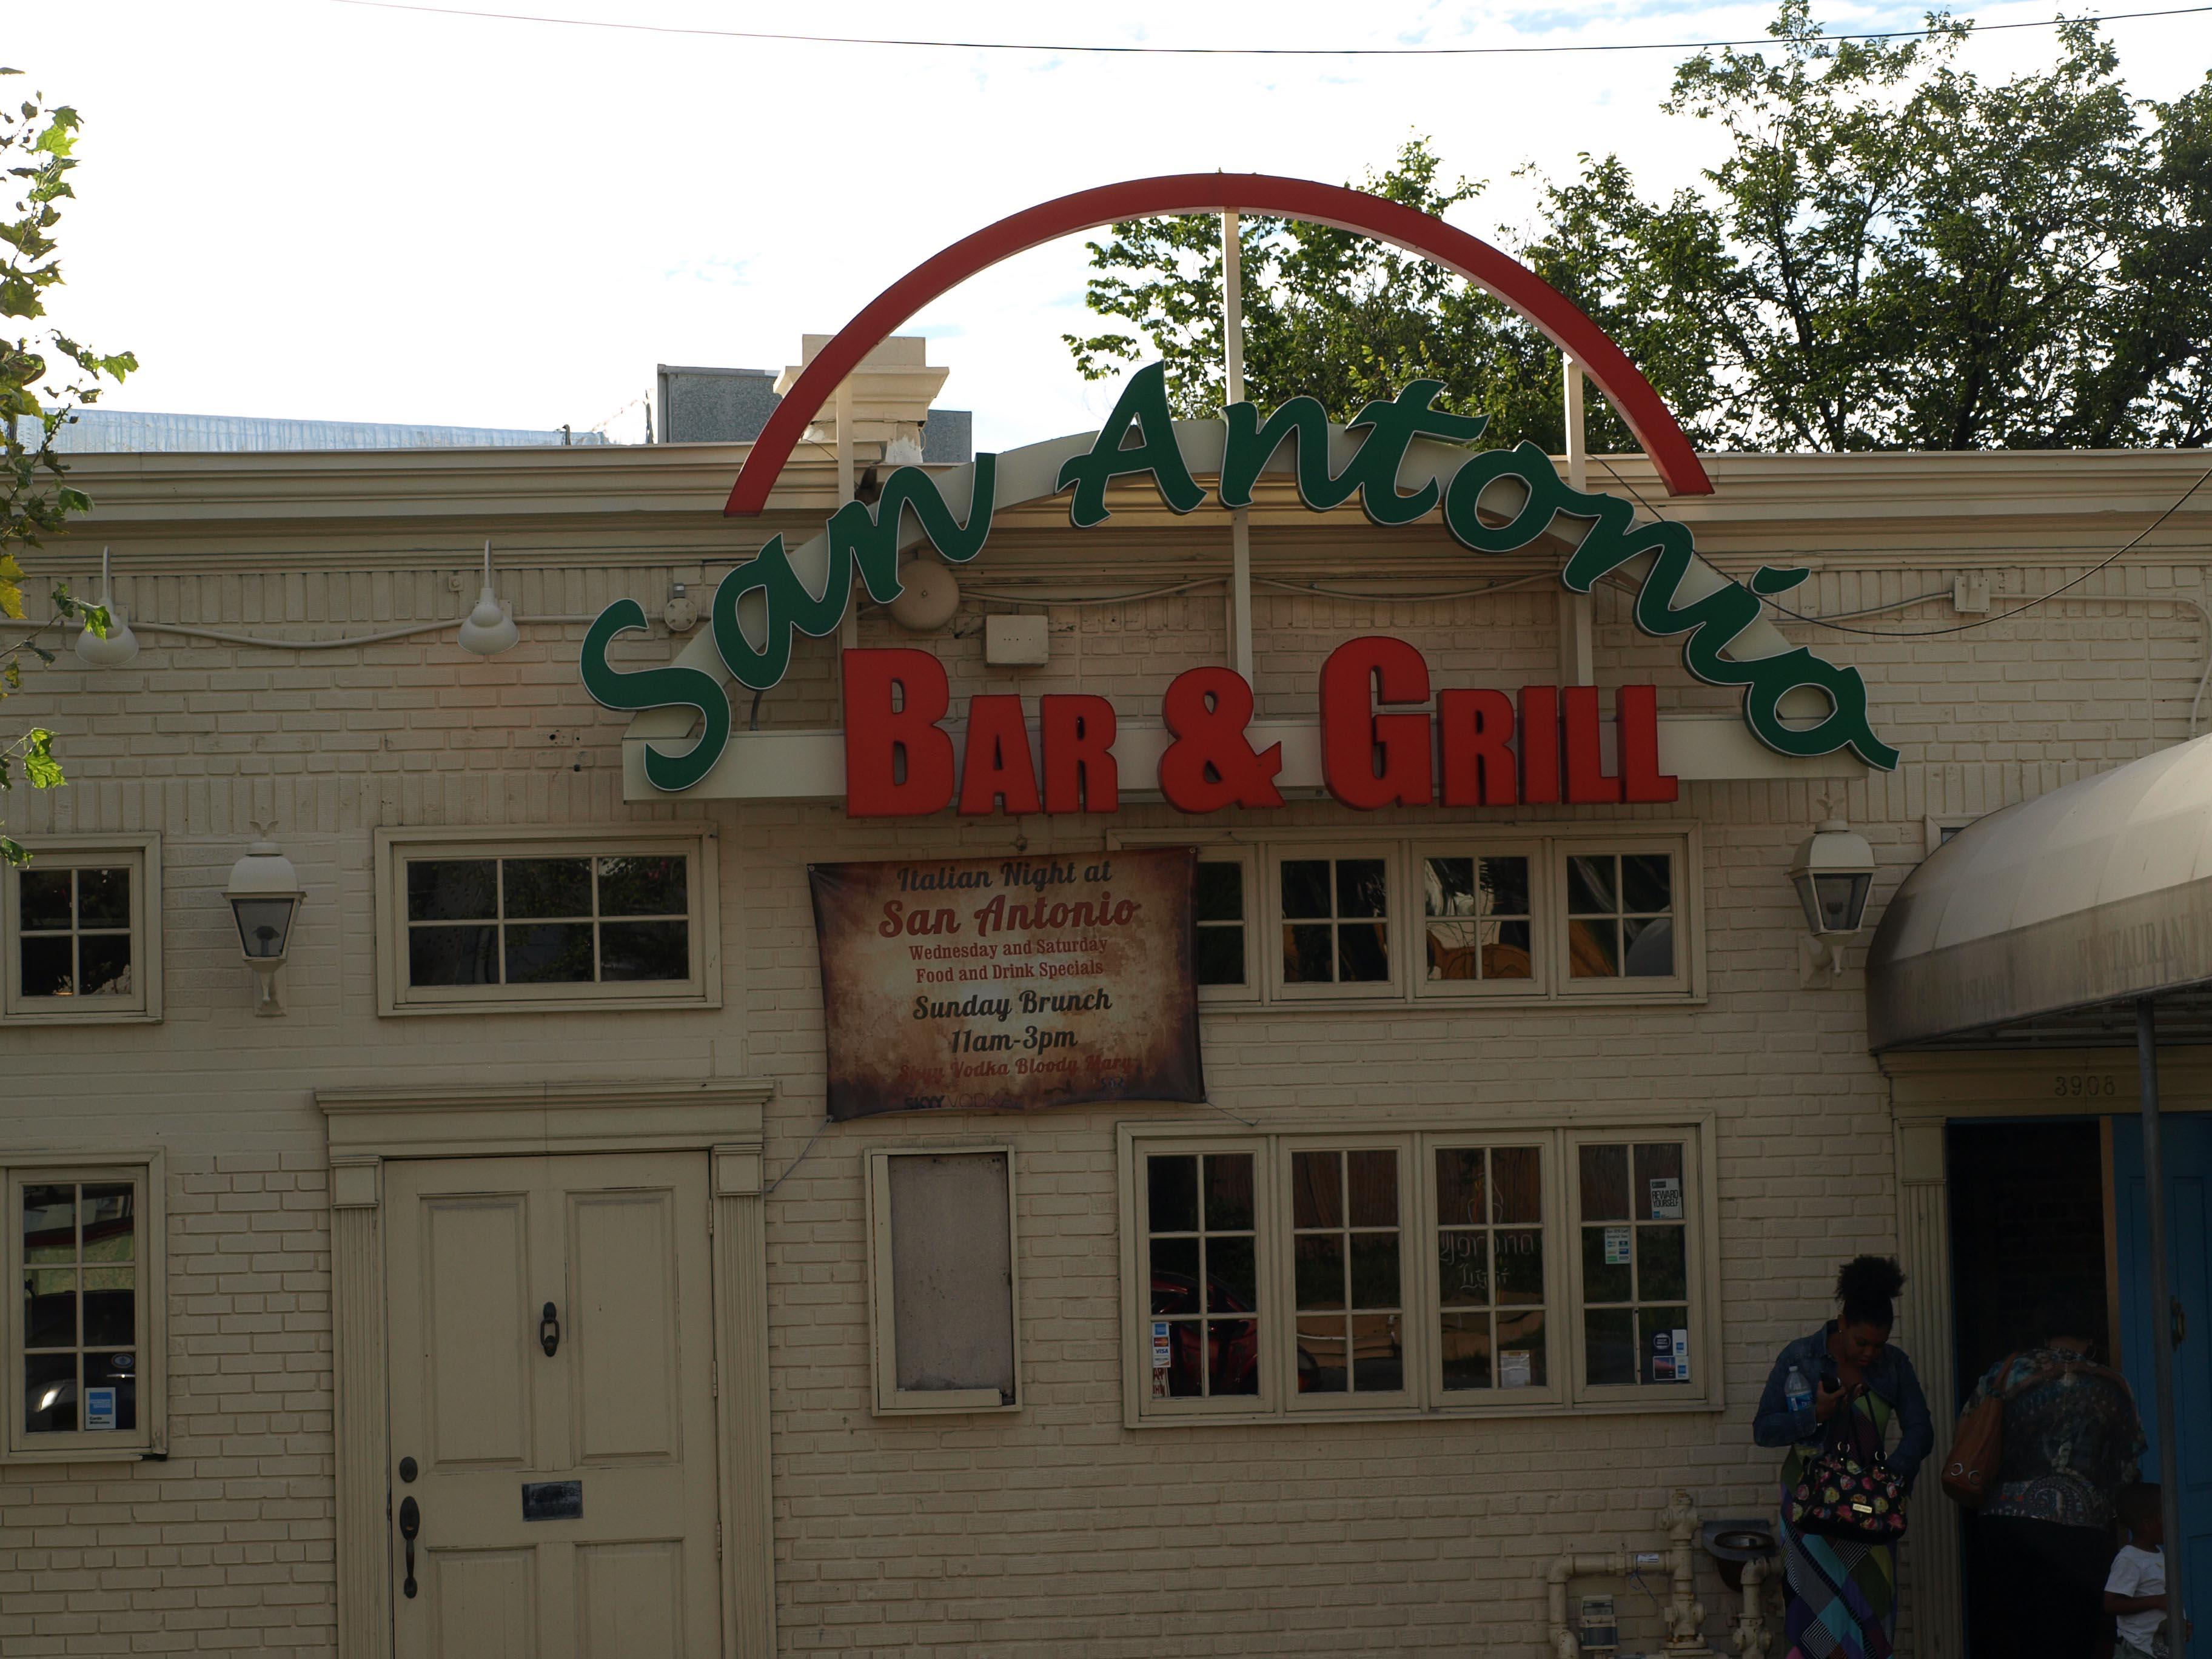 san Antonio Bar & Grill